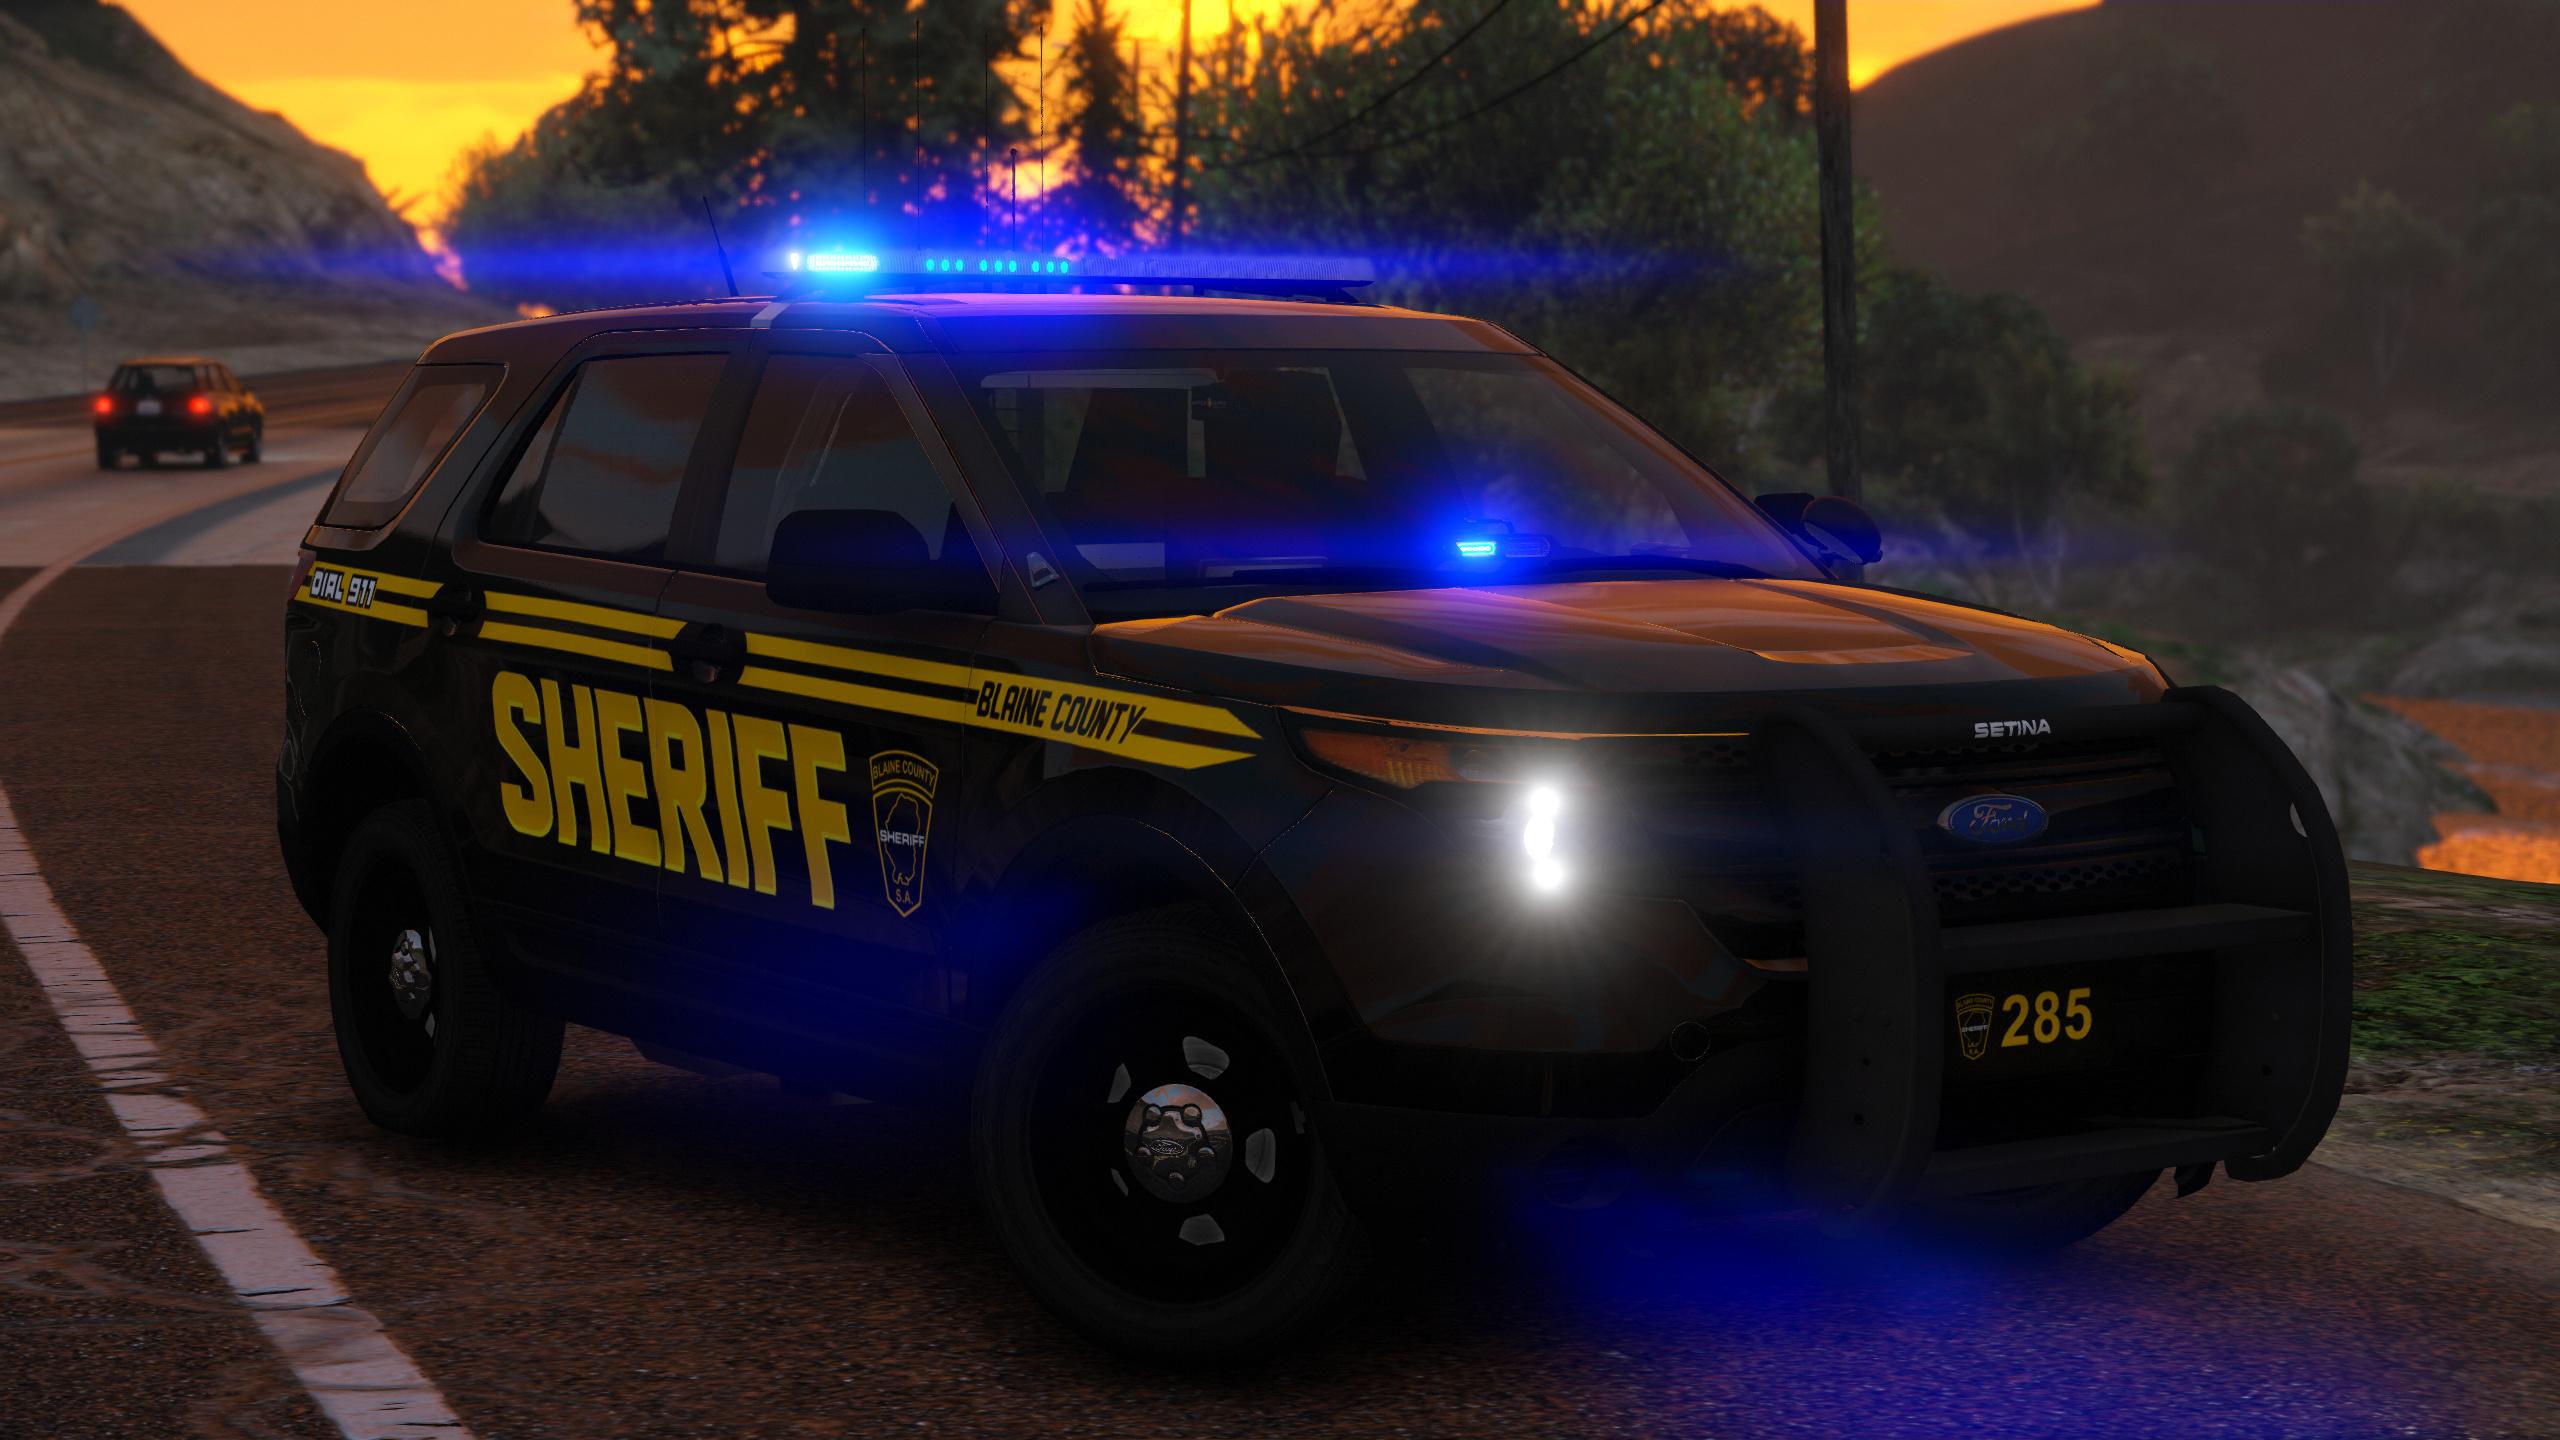 Release] Law Enforcement Vehicle Pack | ELS Only - Releases - FiveM